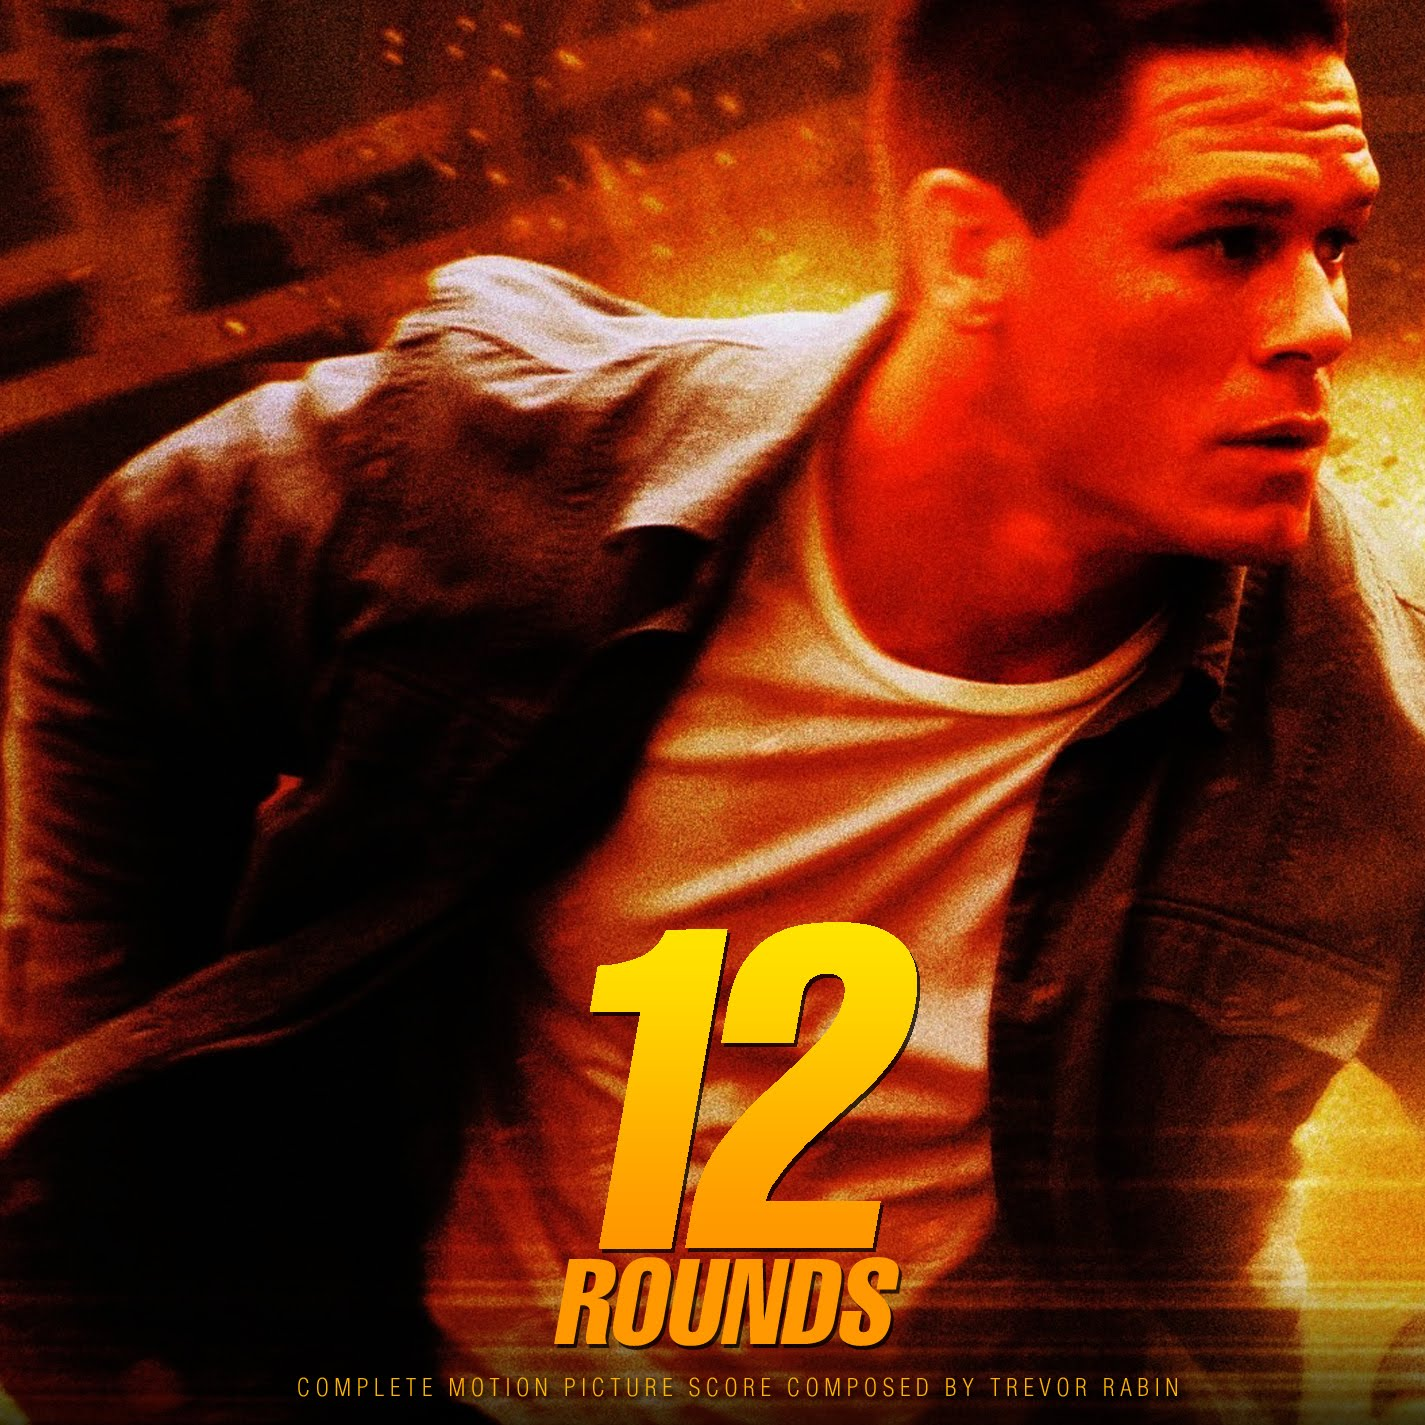 Arbeitsblatt Runden Full Movie : Rounds movie free download in hindi gp videos